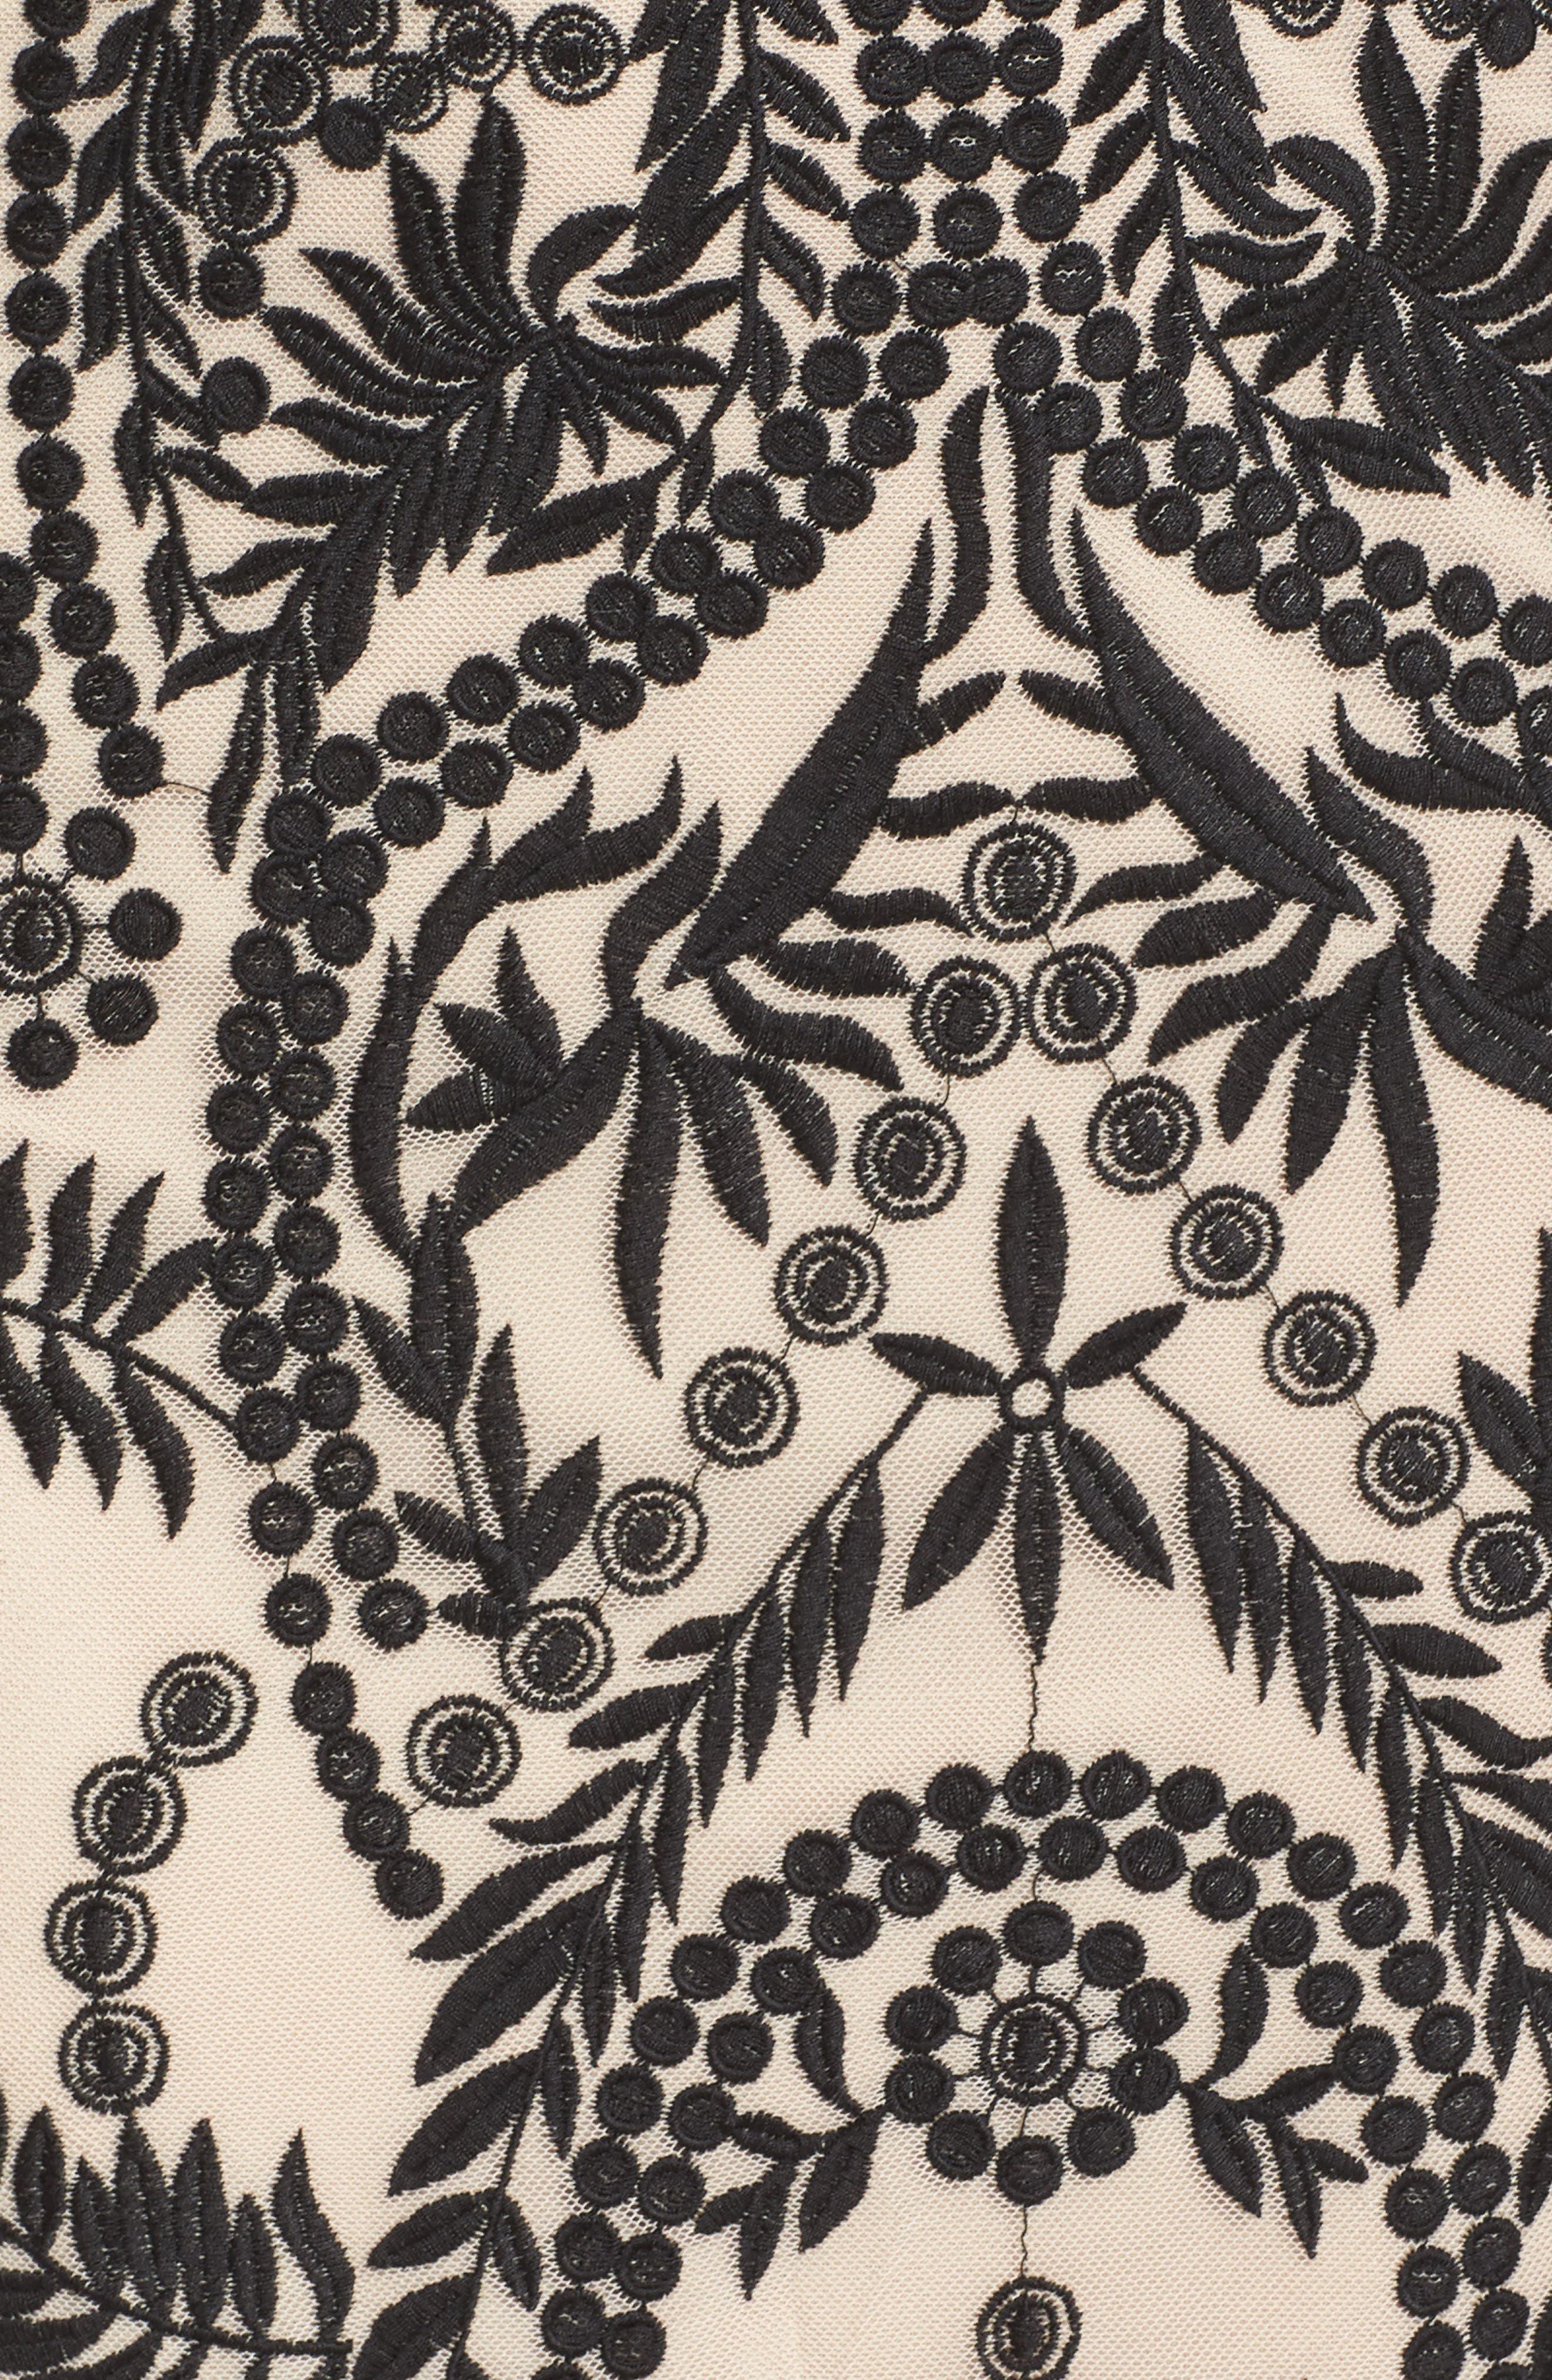 Mesh Halter Midi Dress,                             Alternate thumbnail 5, color,                             019